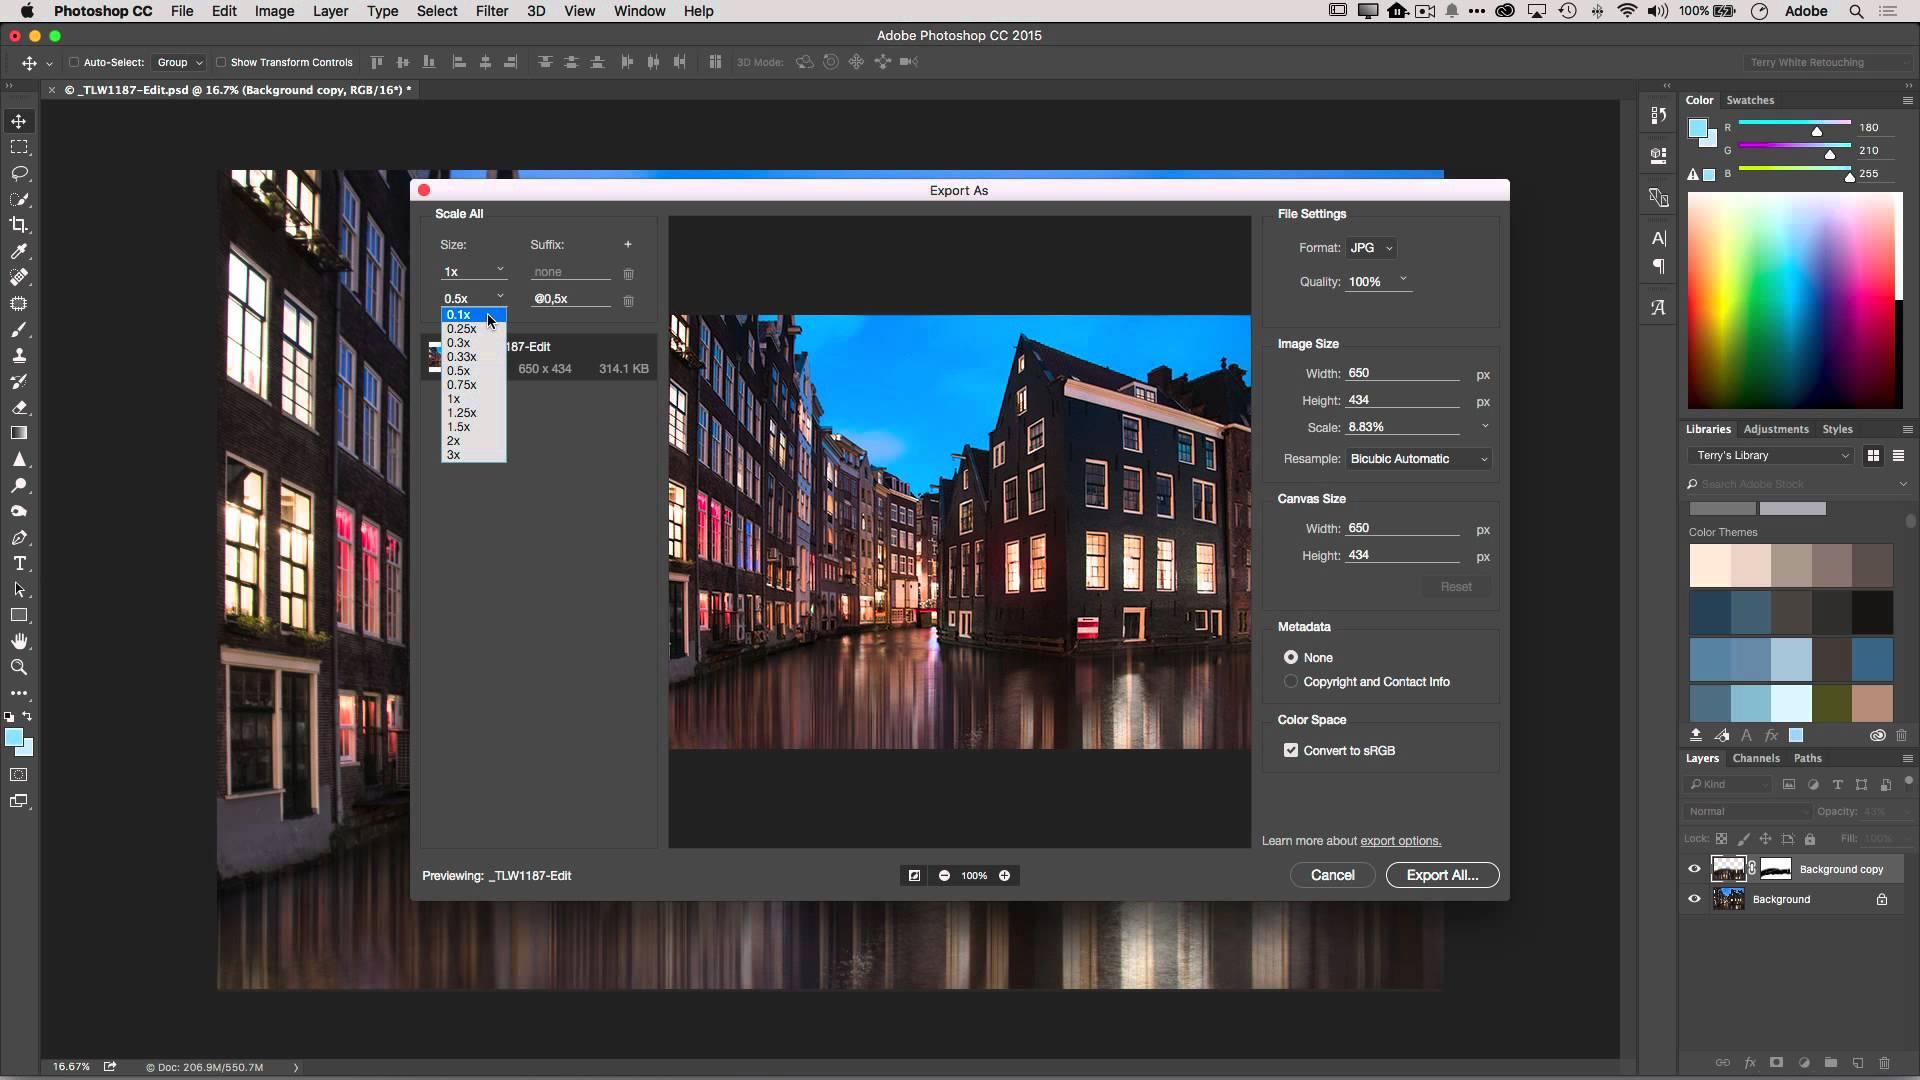 Оптимизация изображений на сайте